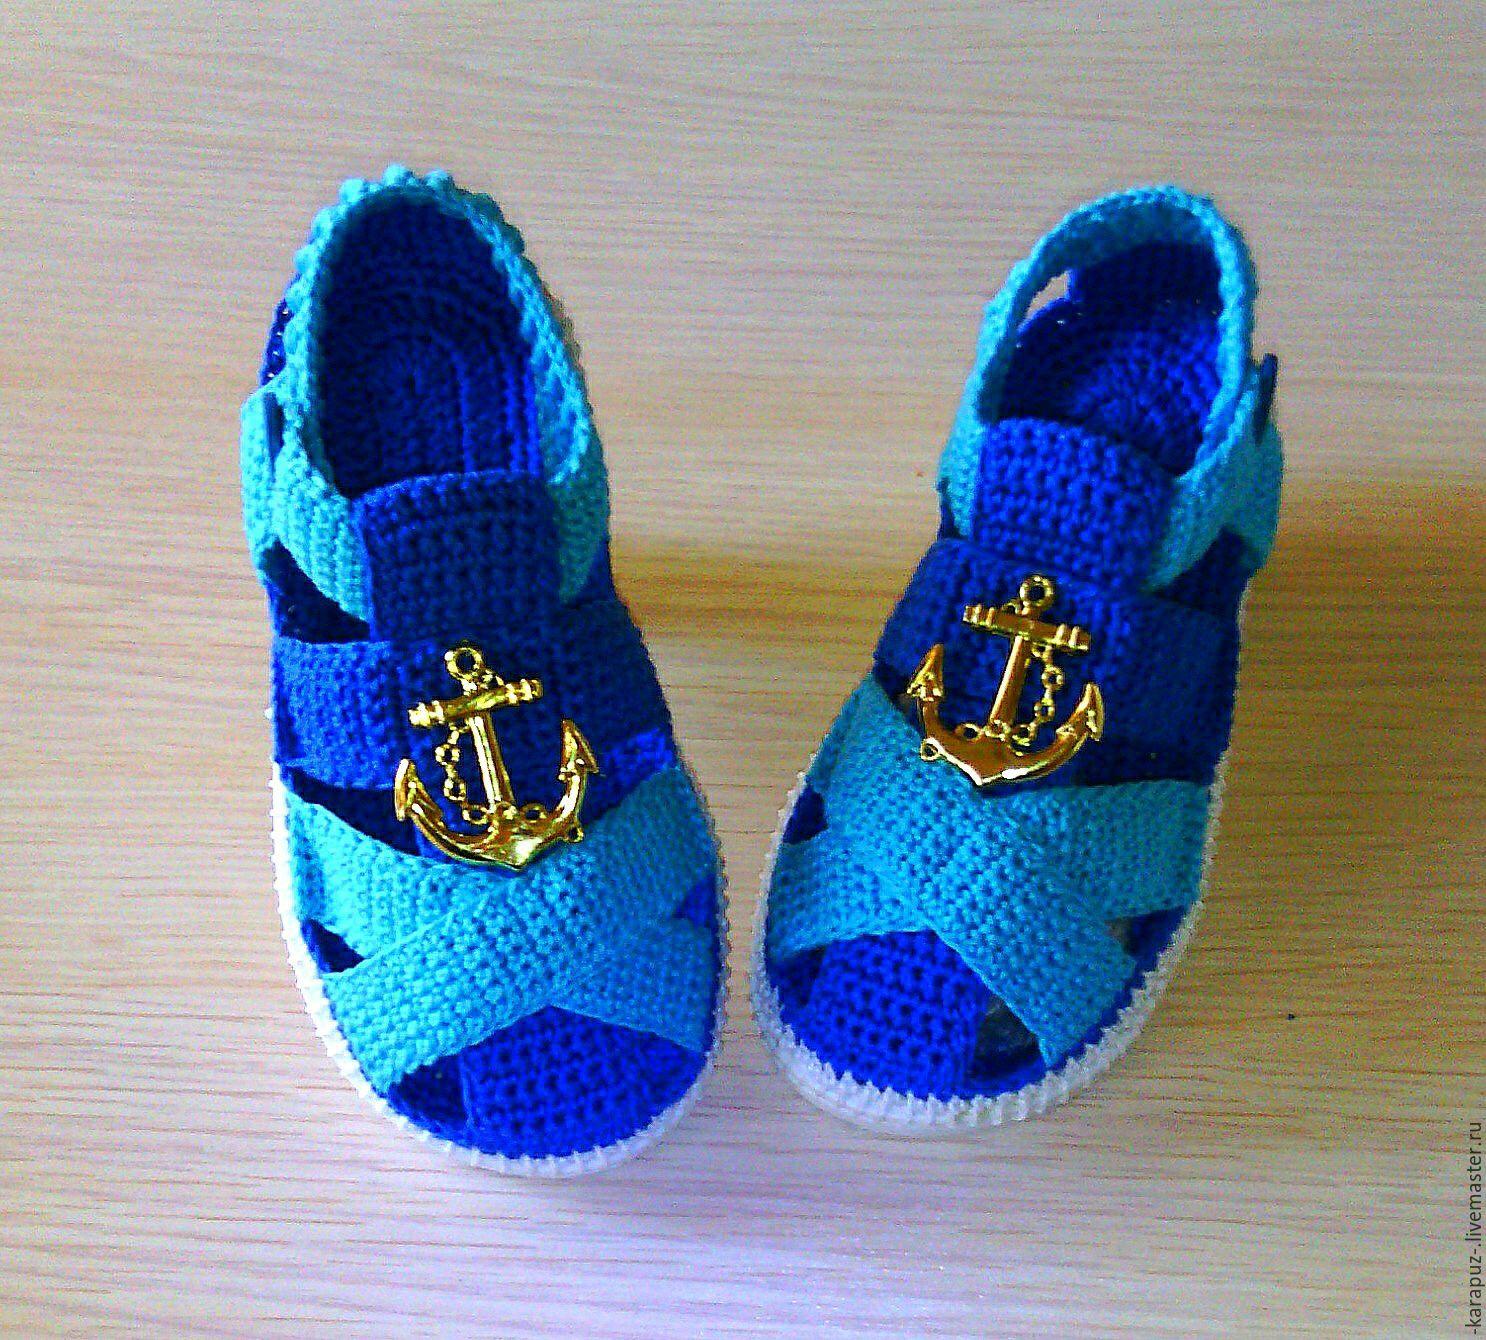 Como hacer zapatillas a crochet para bebes